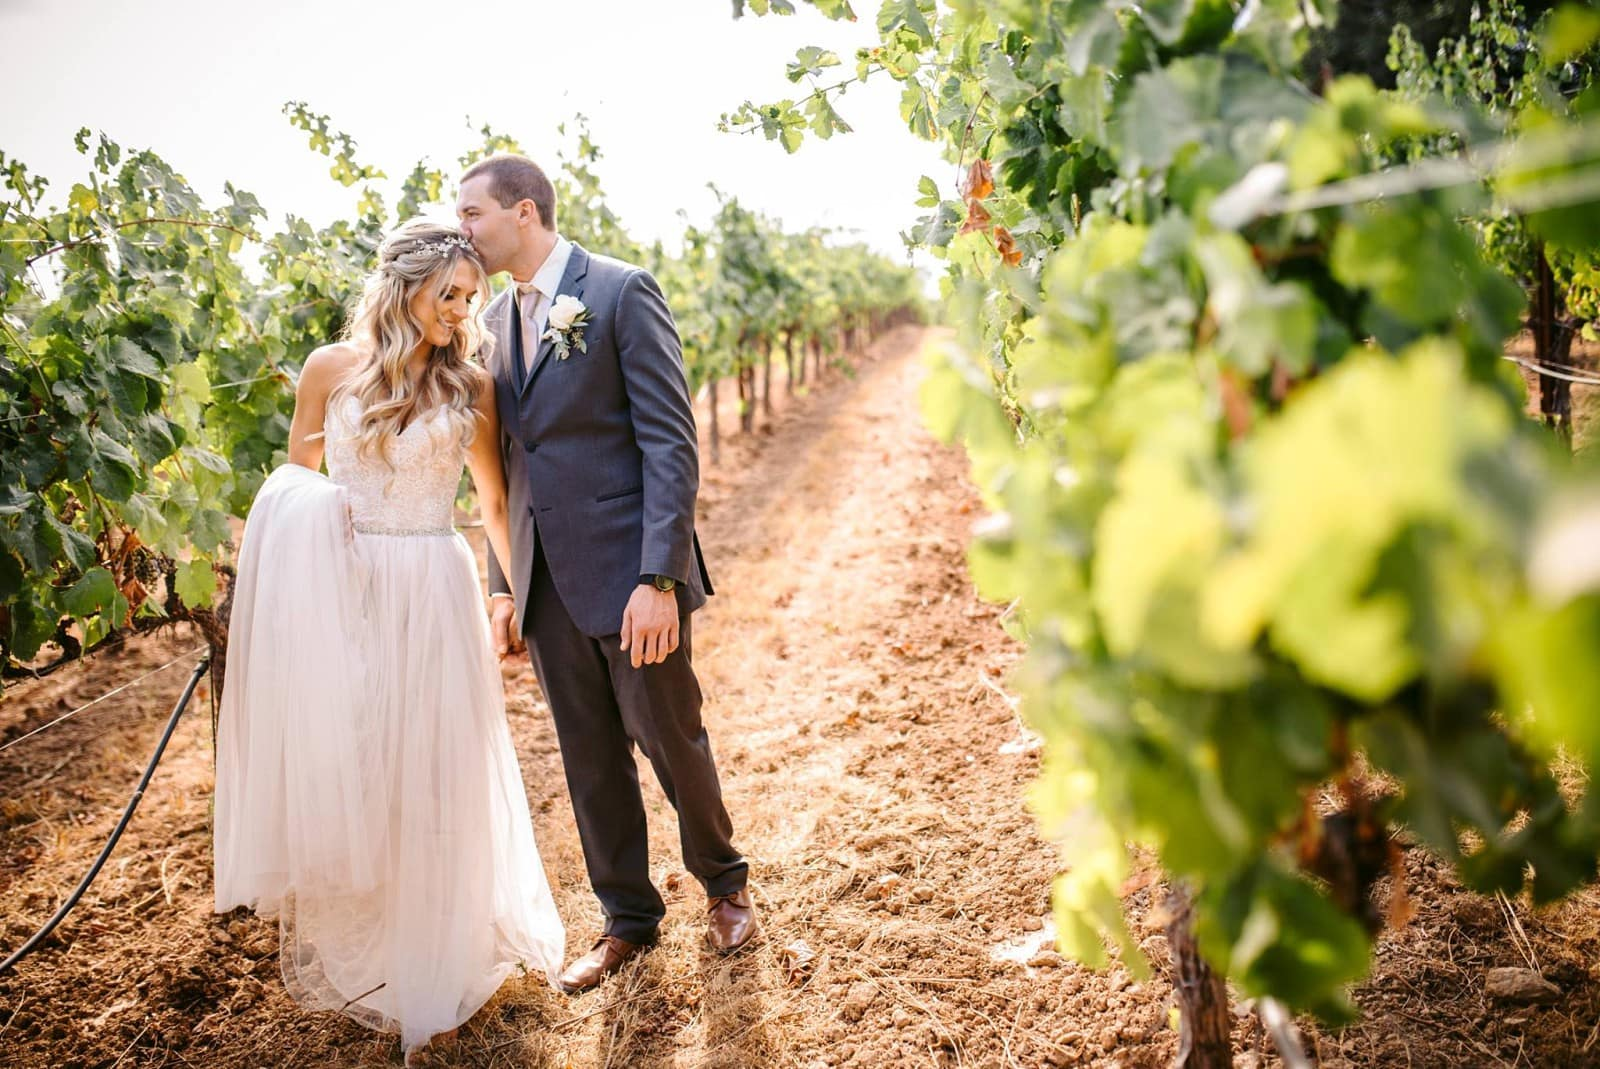 49a04b8843 Discover The Dalton Ranch | A Hidden Gem for Wine Country Weddings |  Destination Wedding Details